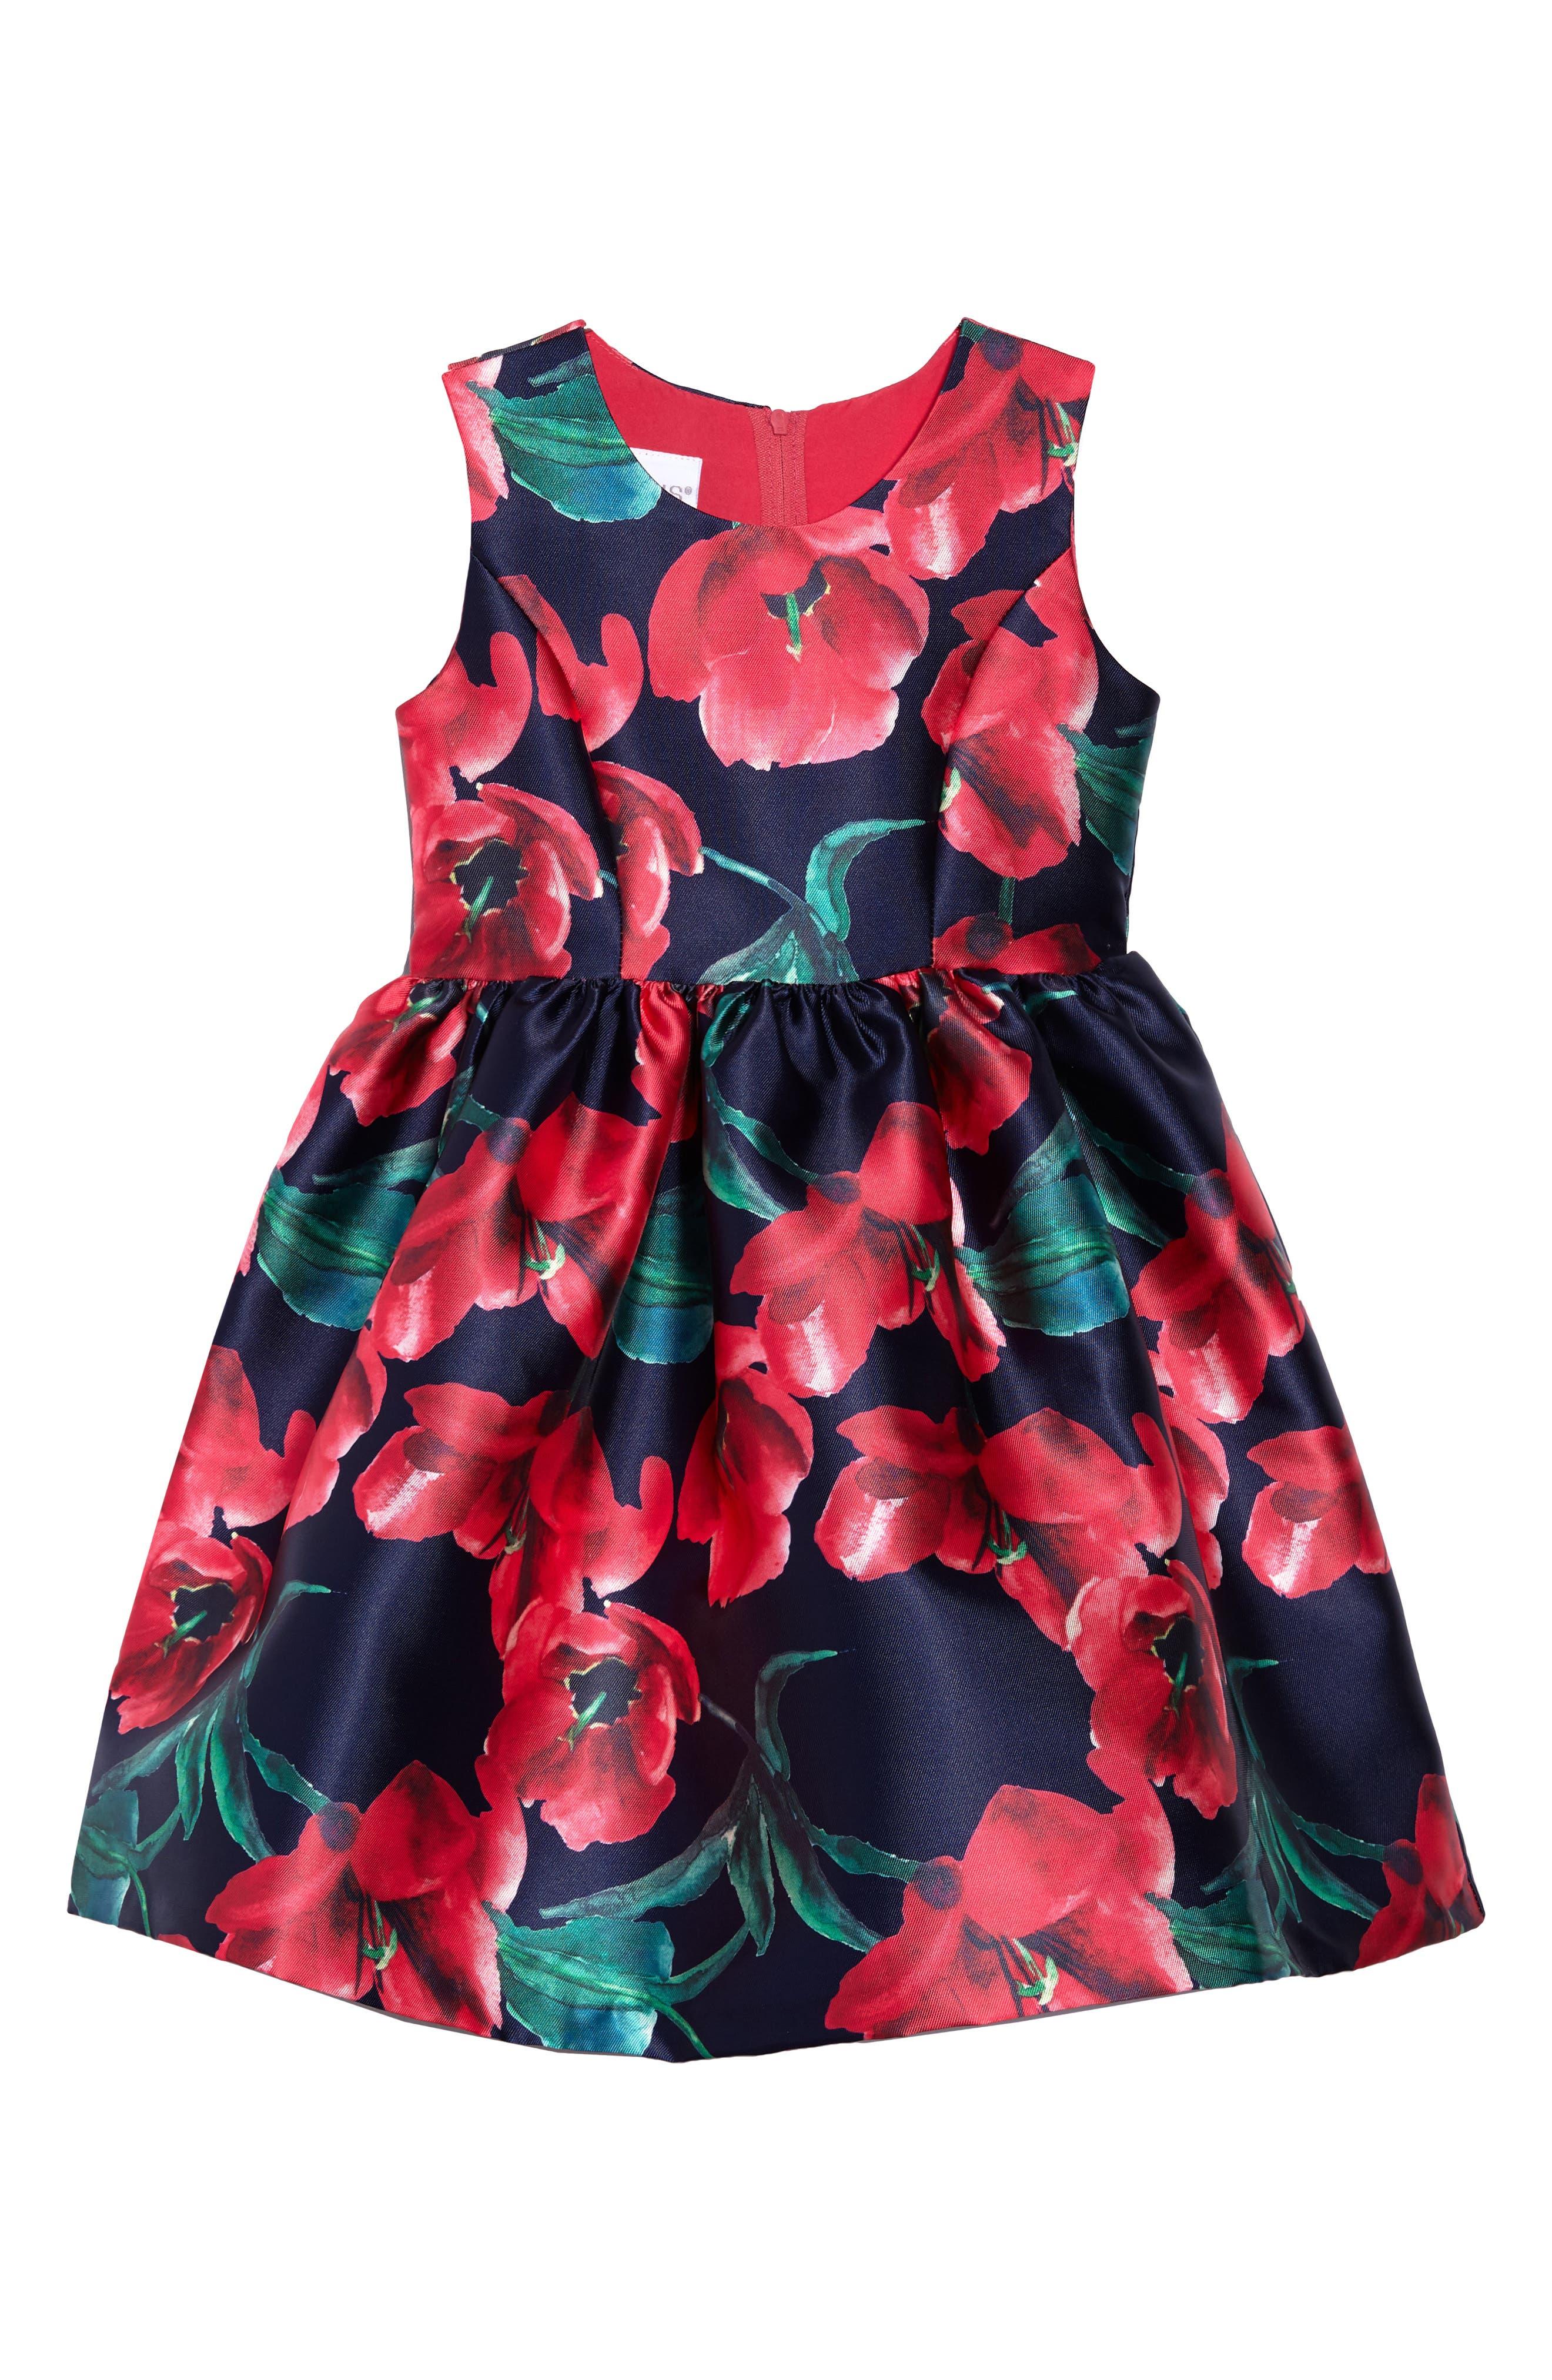 Poppy Party Dress,                             Main thumbnail 1, color,                             410